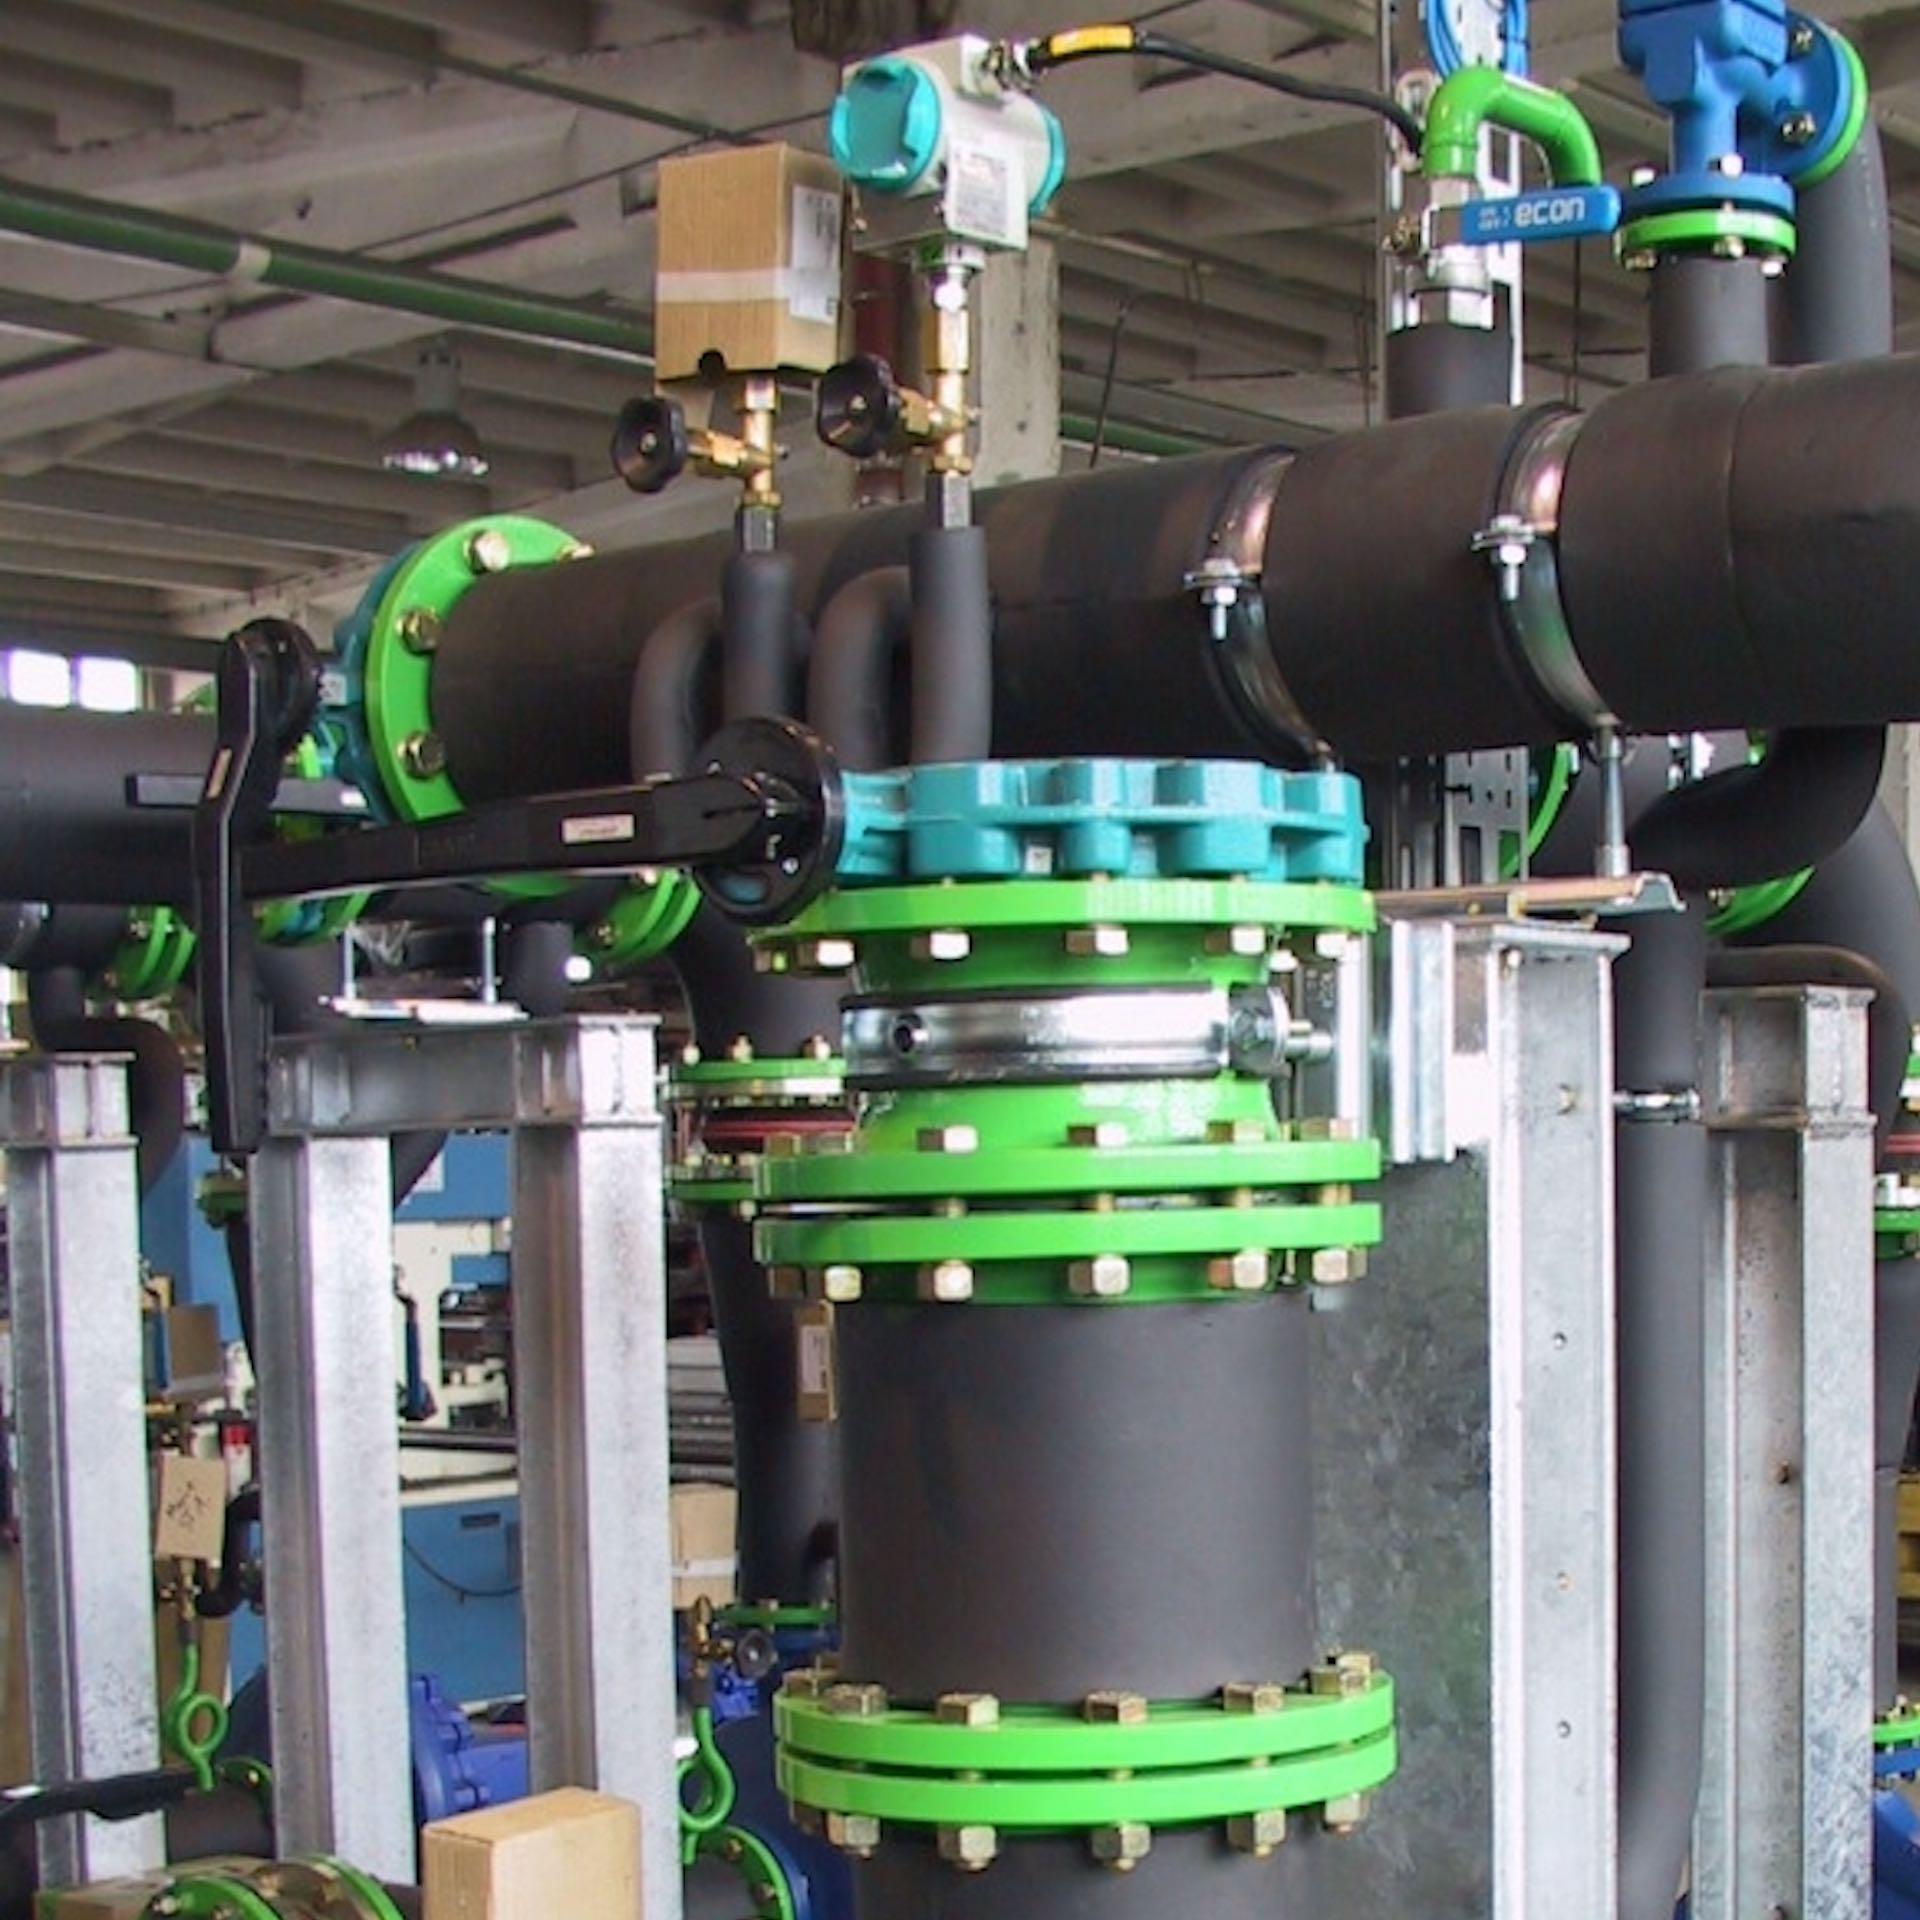 GWA_cooling_systems_technology_pump_skid_pump_group_2_Gesellschaft_fuer_Waerme_und_Anlagentechnik_mbH